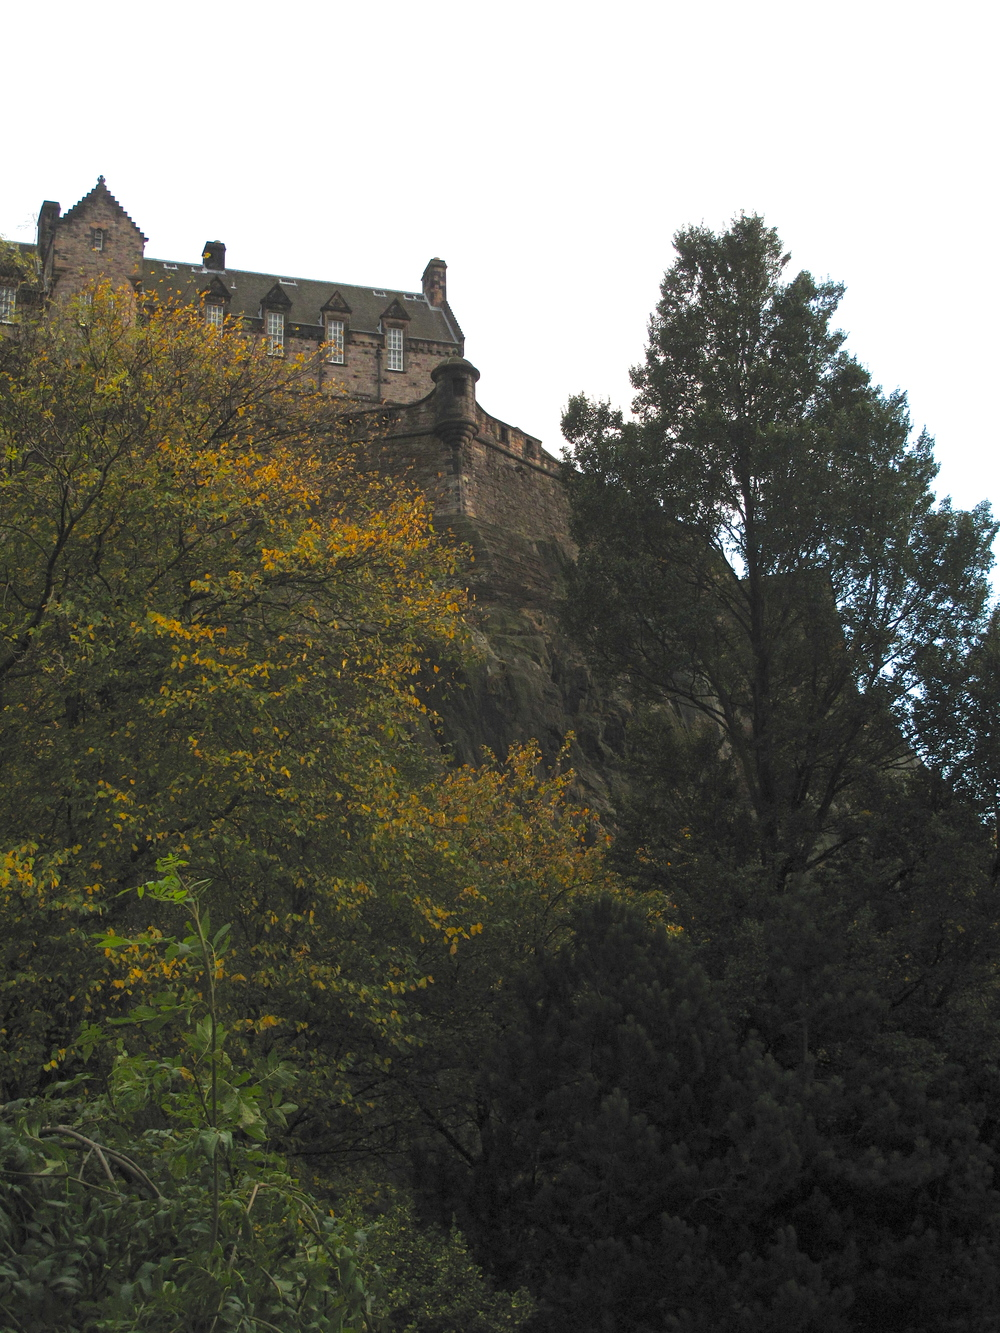 Edinburgh Castle seen from Princes Street Gardens - at dusk in autumn.